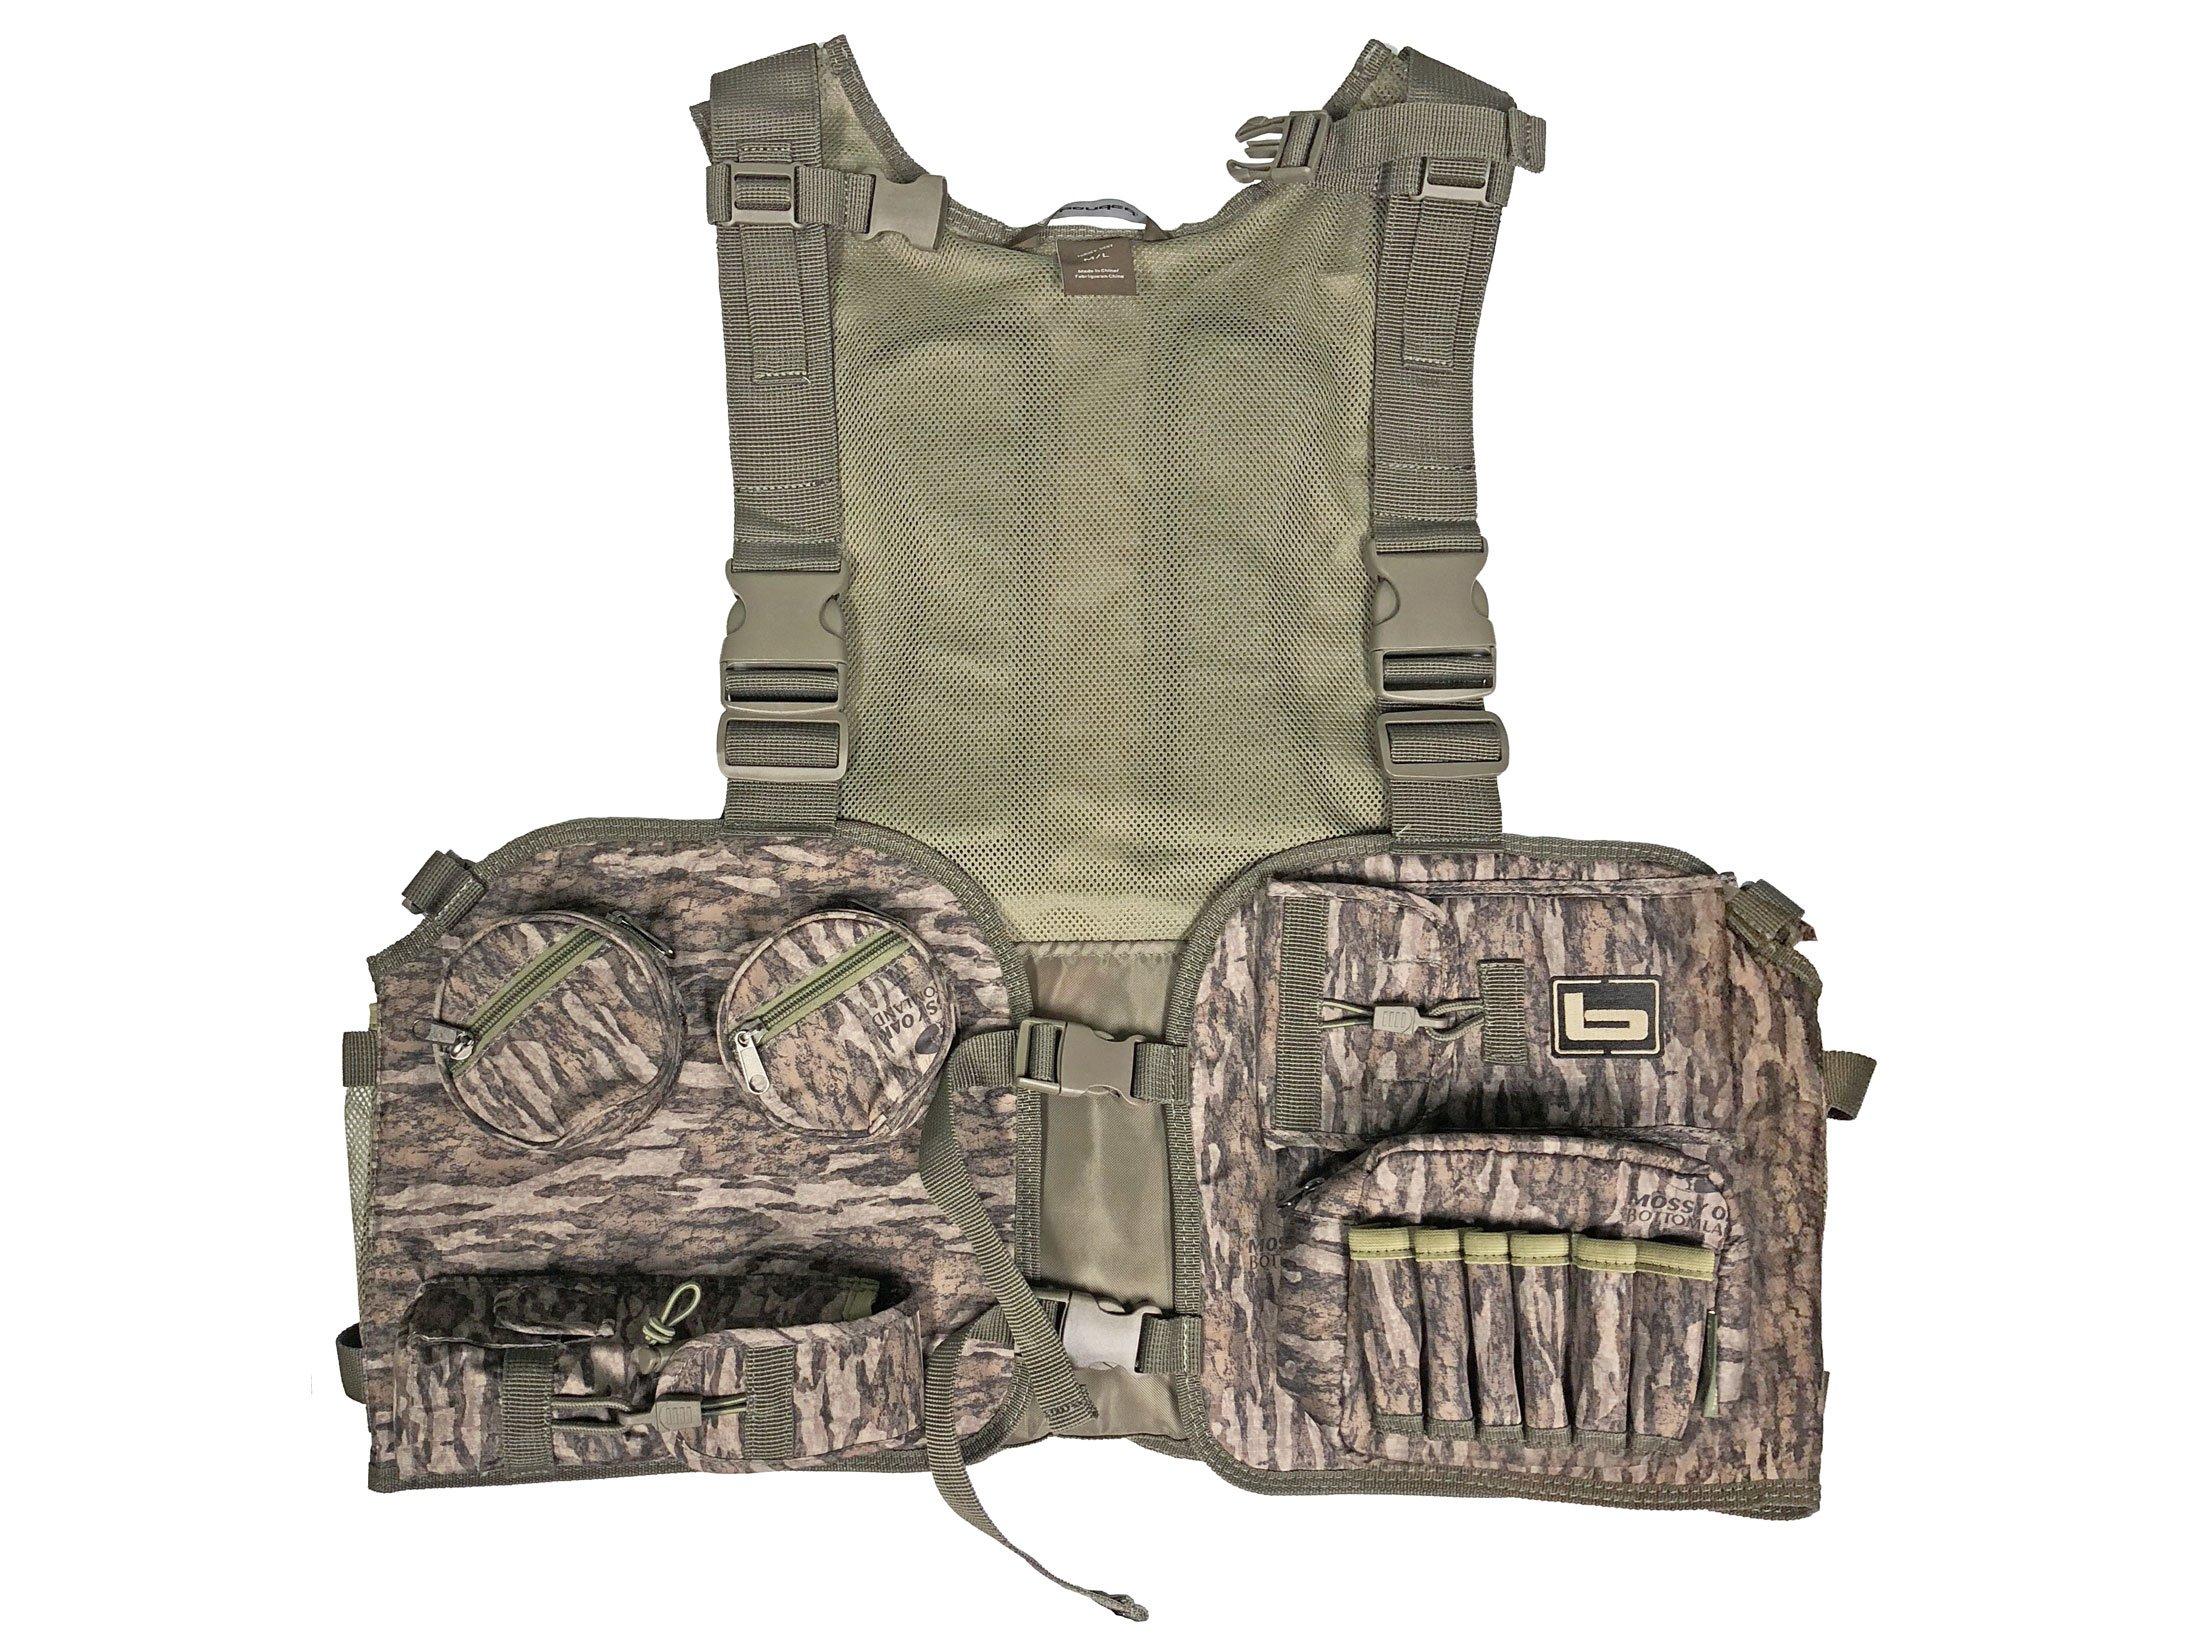 Banded Mossy Oak Bottomland Turkey Vest XL/2XL B1150002-OBL-X2X